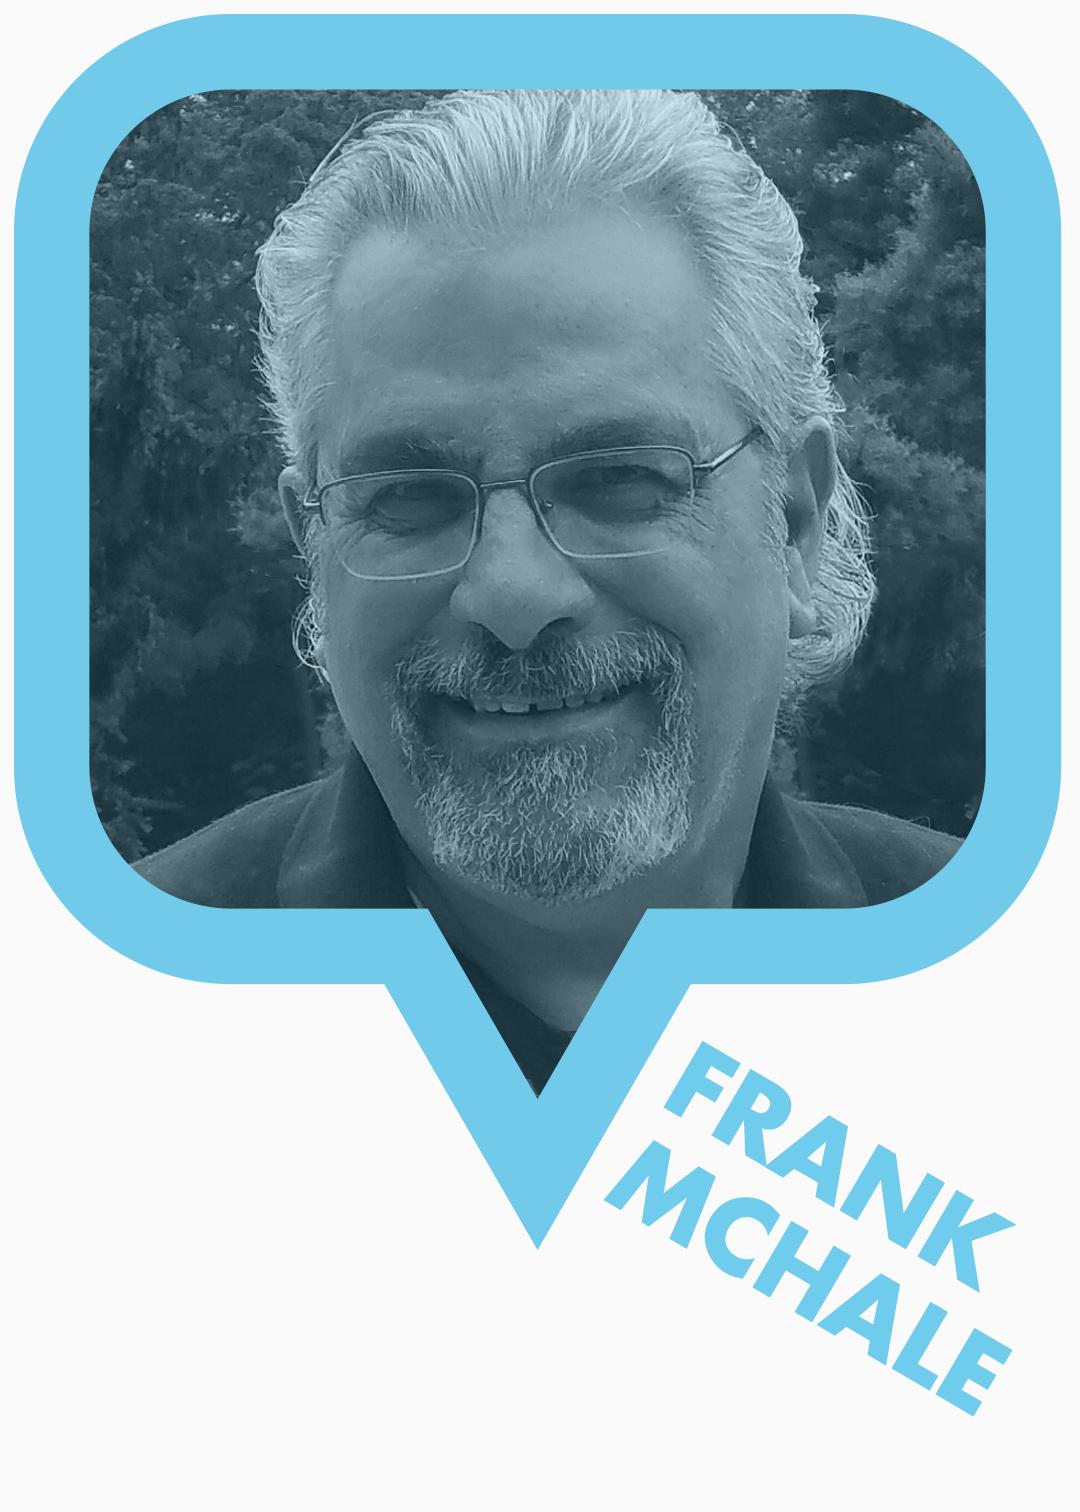 MAS_Frank_McHale2.jpg